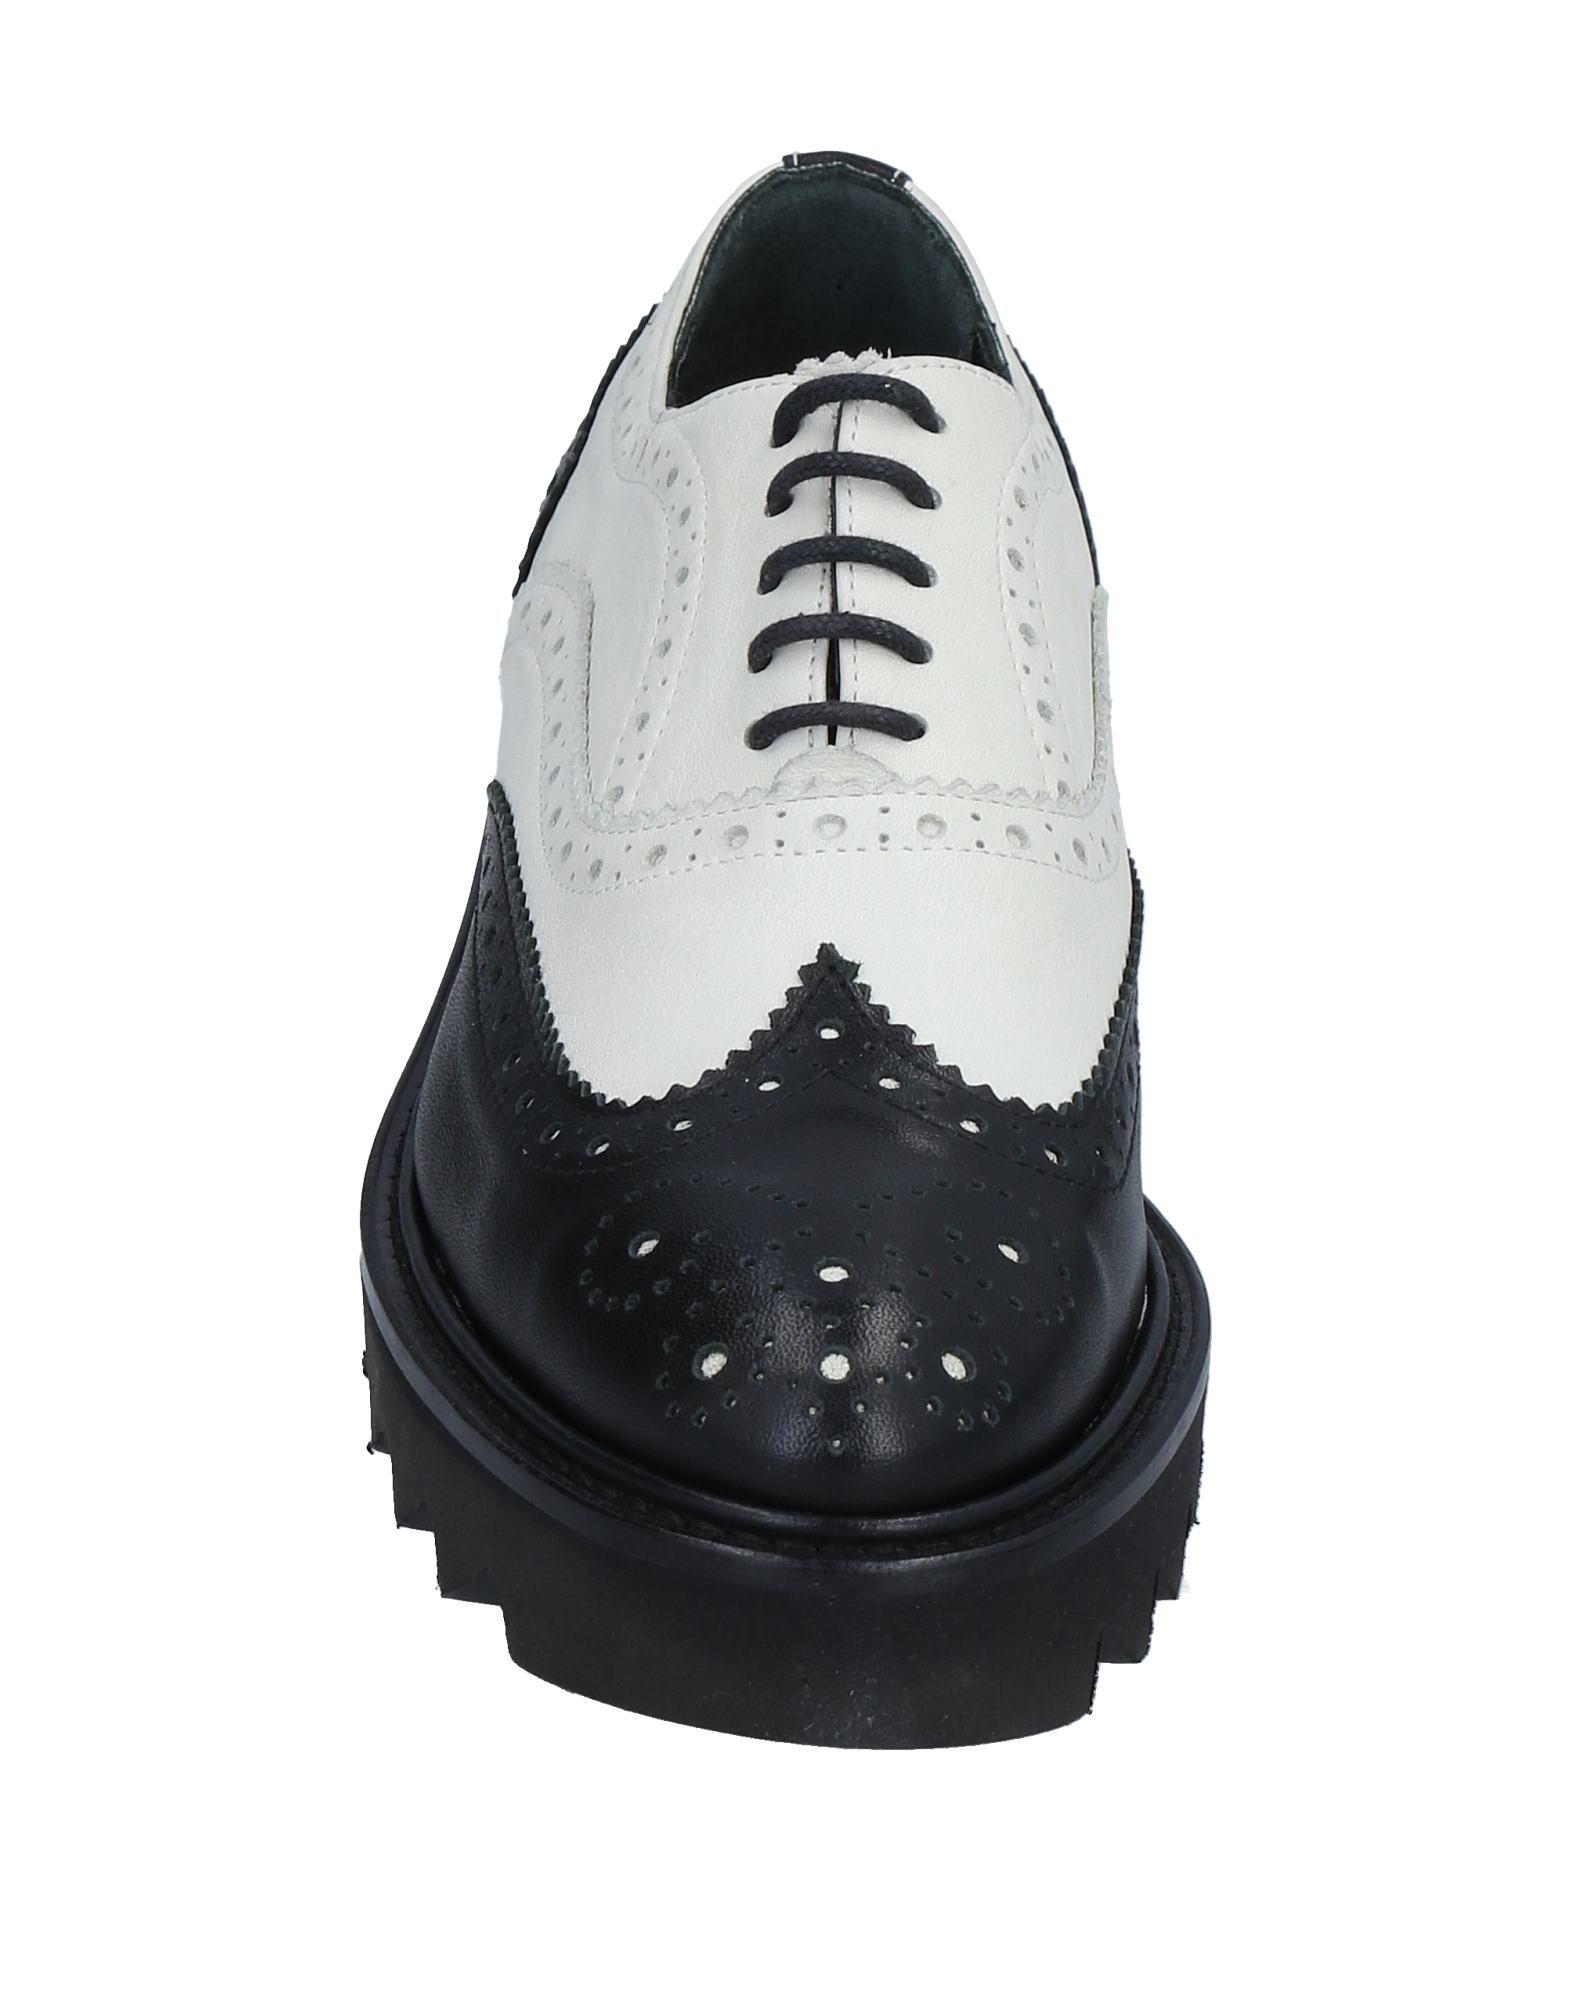 Gut um billige Schuhe Damen zu tragenEntourage Schnürschuhe Damen Schuhe 11534389QI ff0f0d